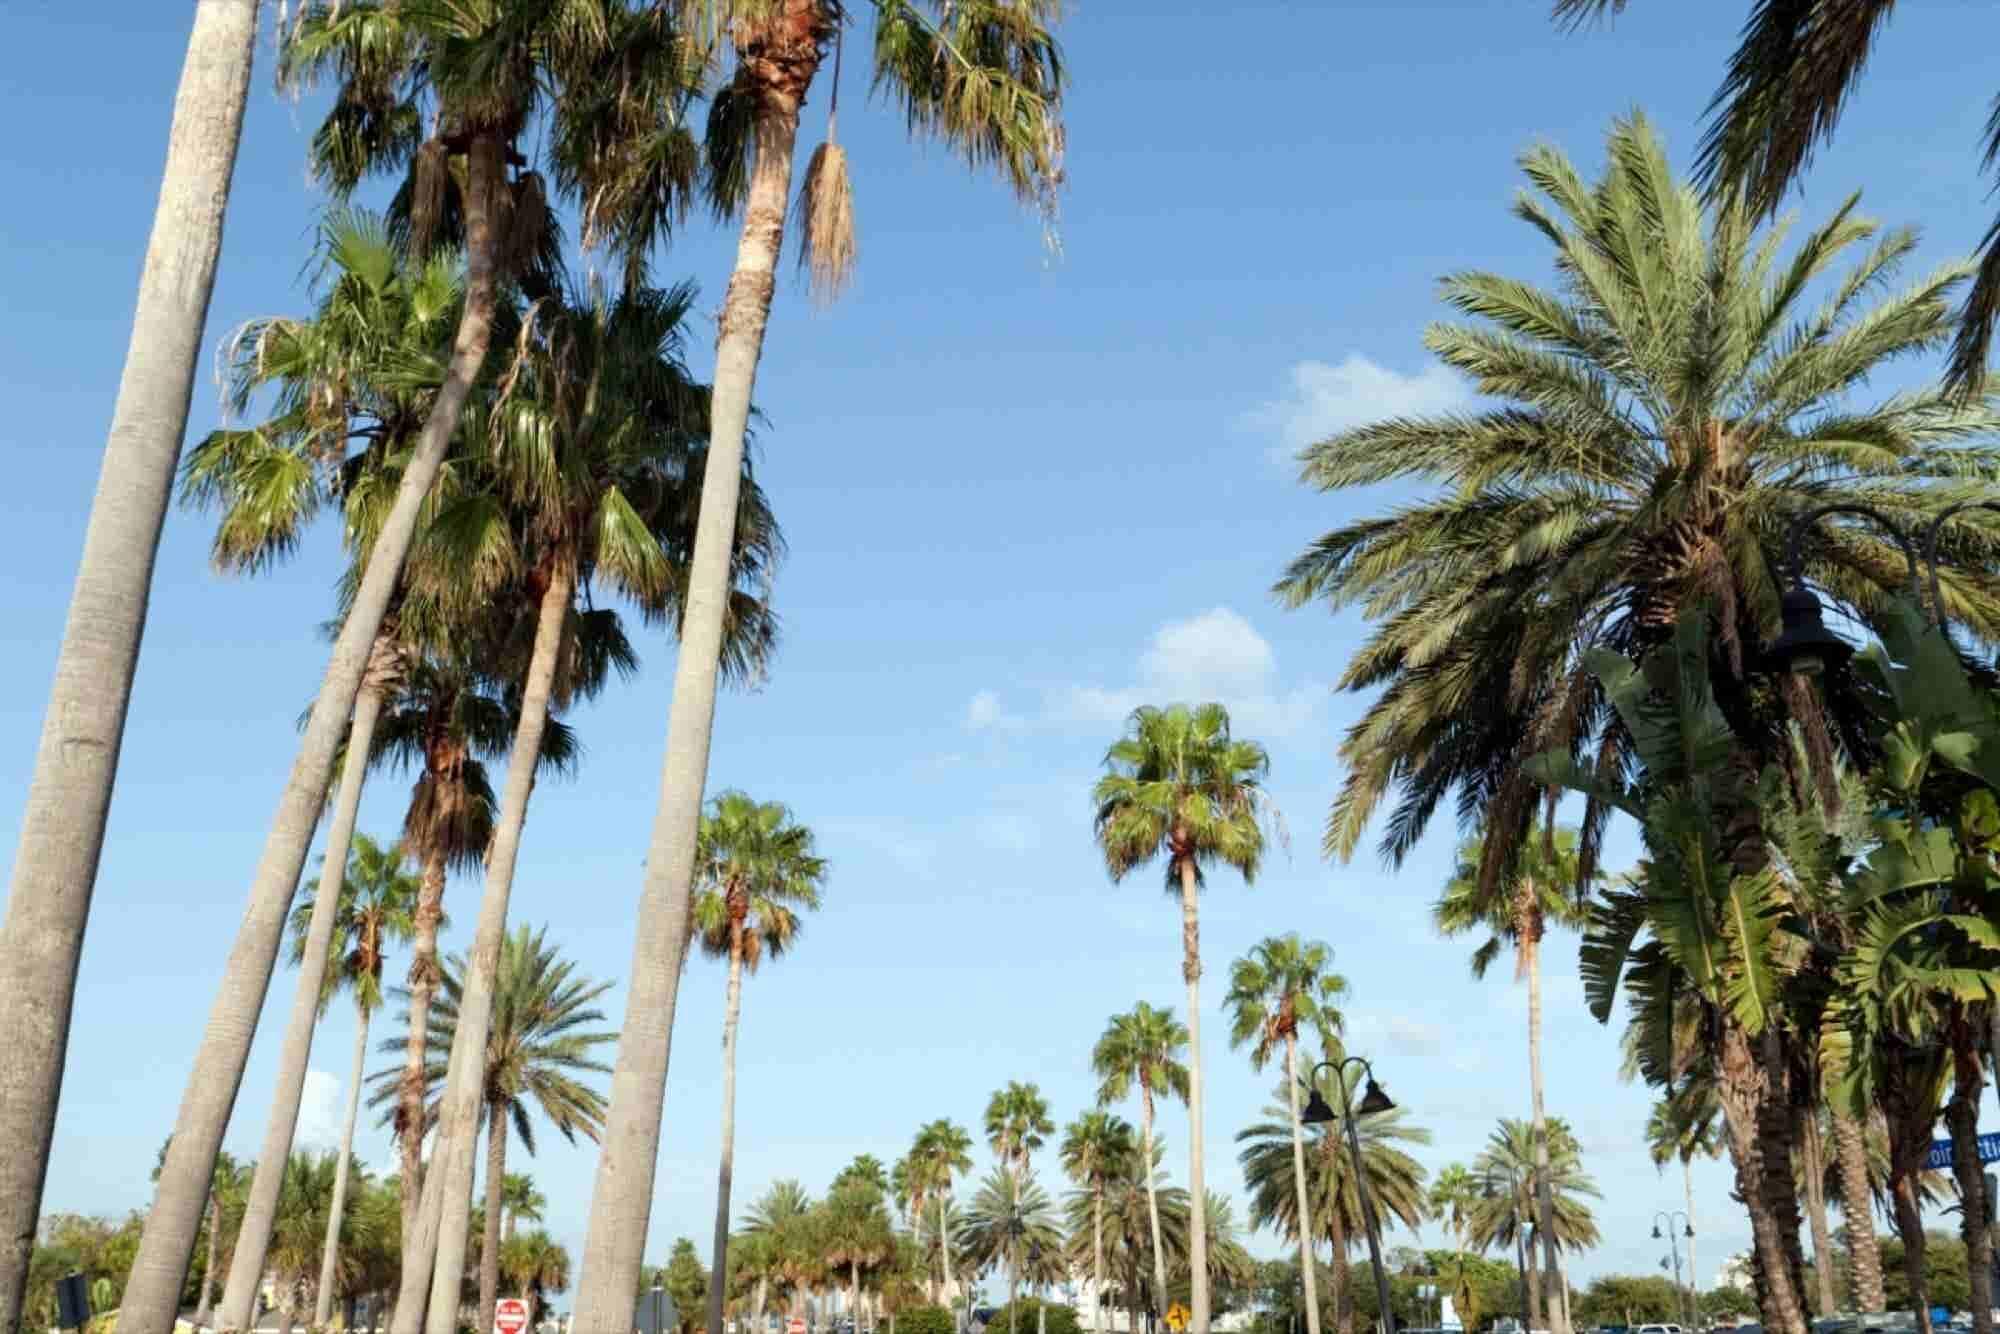 Florida Medical Marijuana System Now In Court